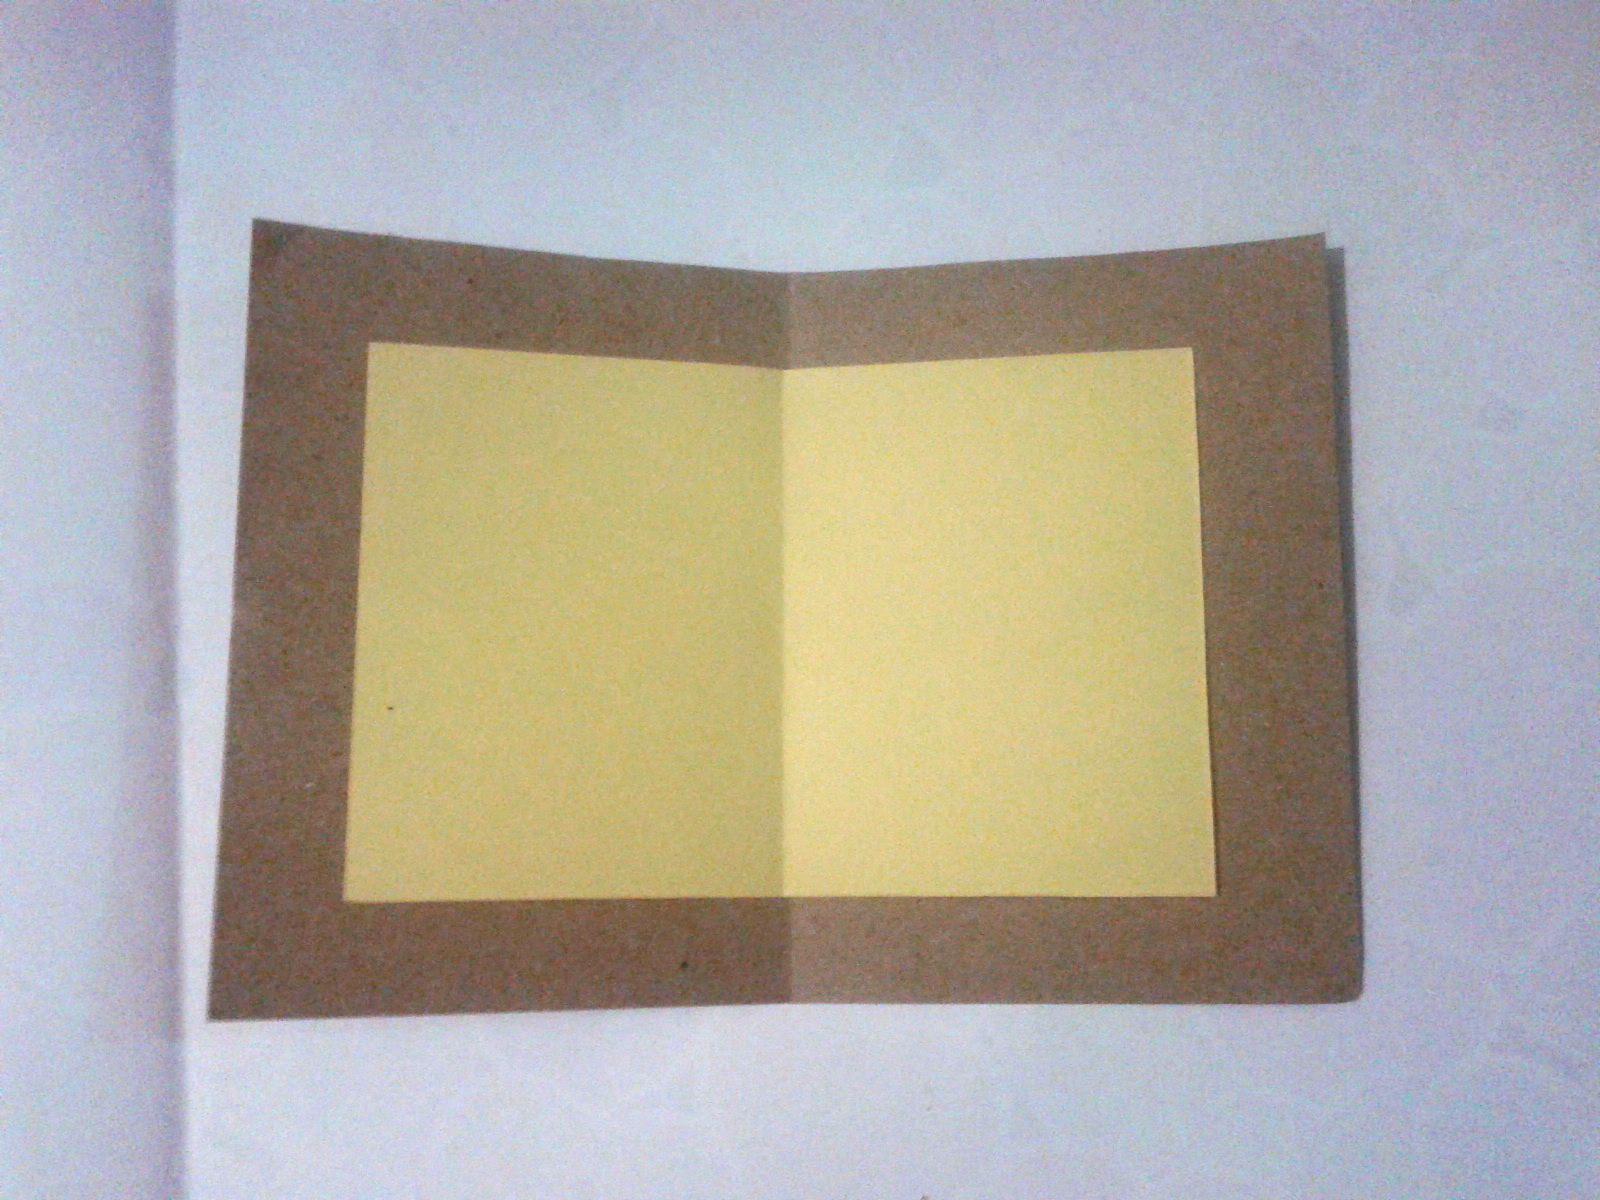 Tutorial Membuat Buku Catatan Kecil Pelangi ( Note-Book